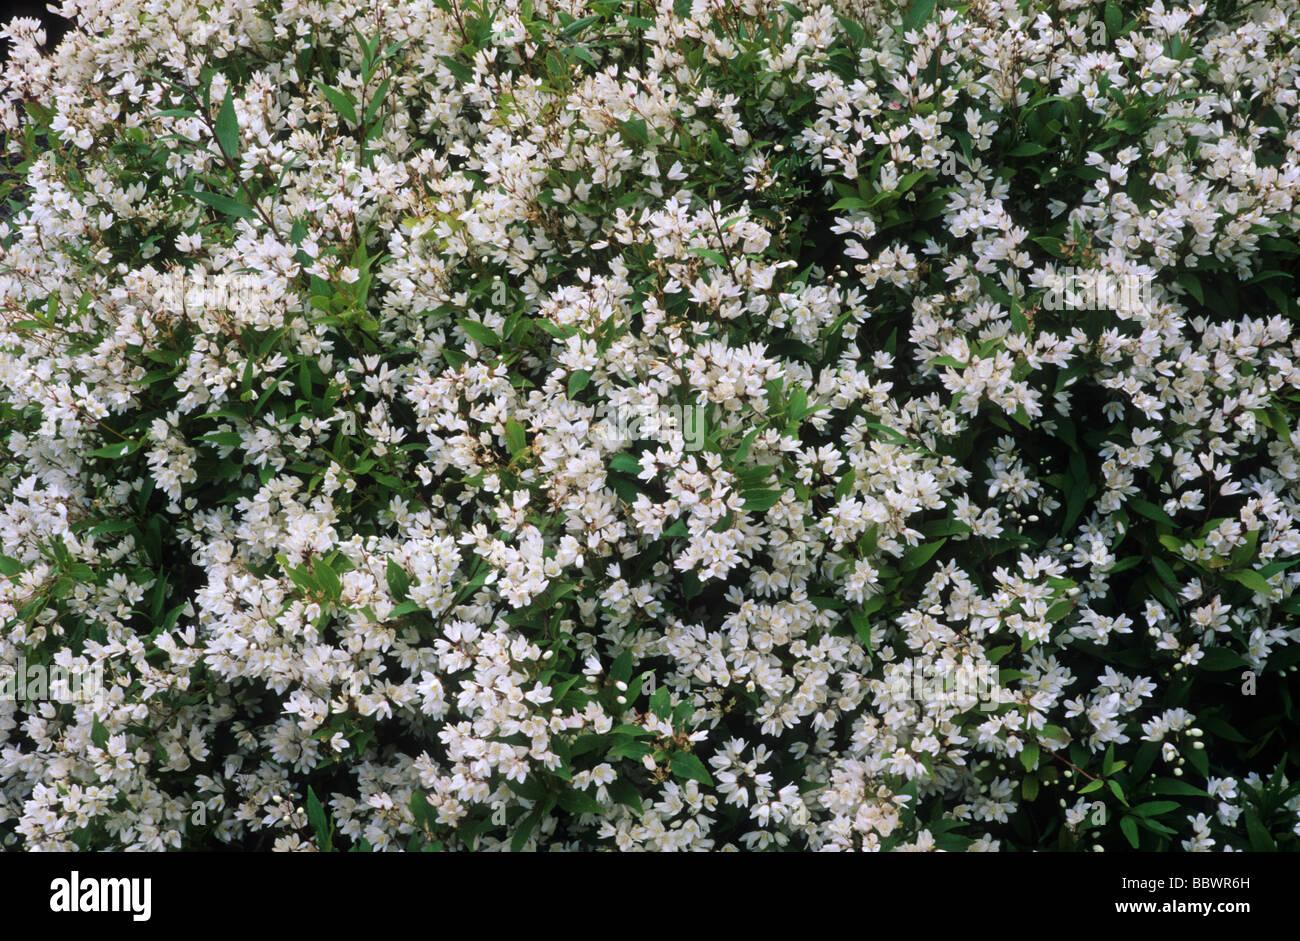 Deutzia gracilis nikko white flower stock photos deutzia gracilis deutzia gracilis nikko white flower flowers garden plant plants stock image mightylinksfo